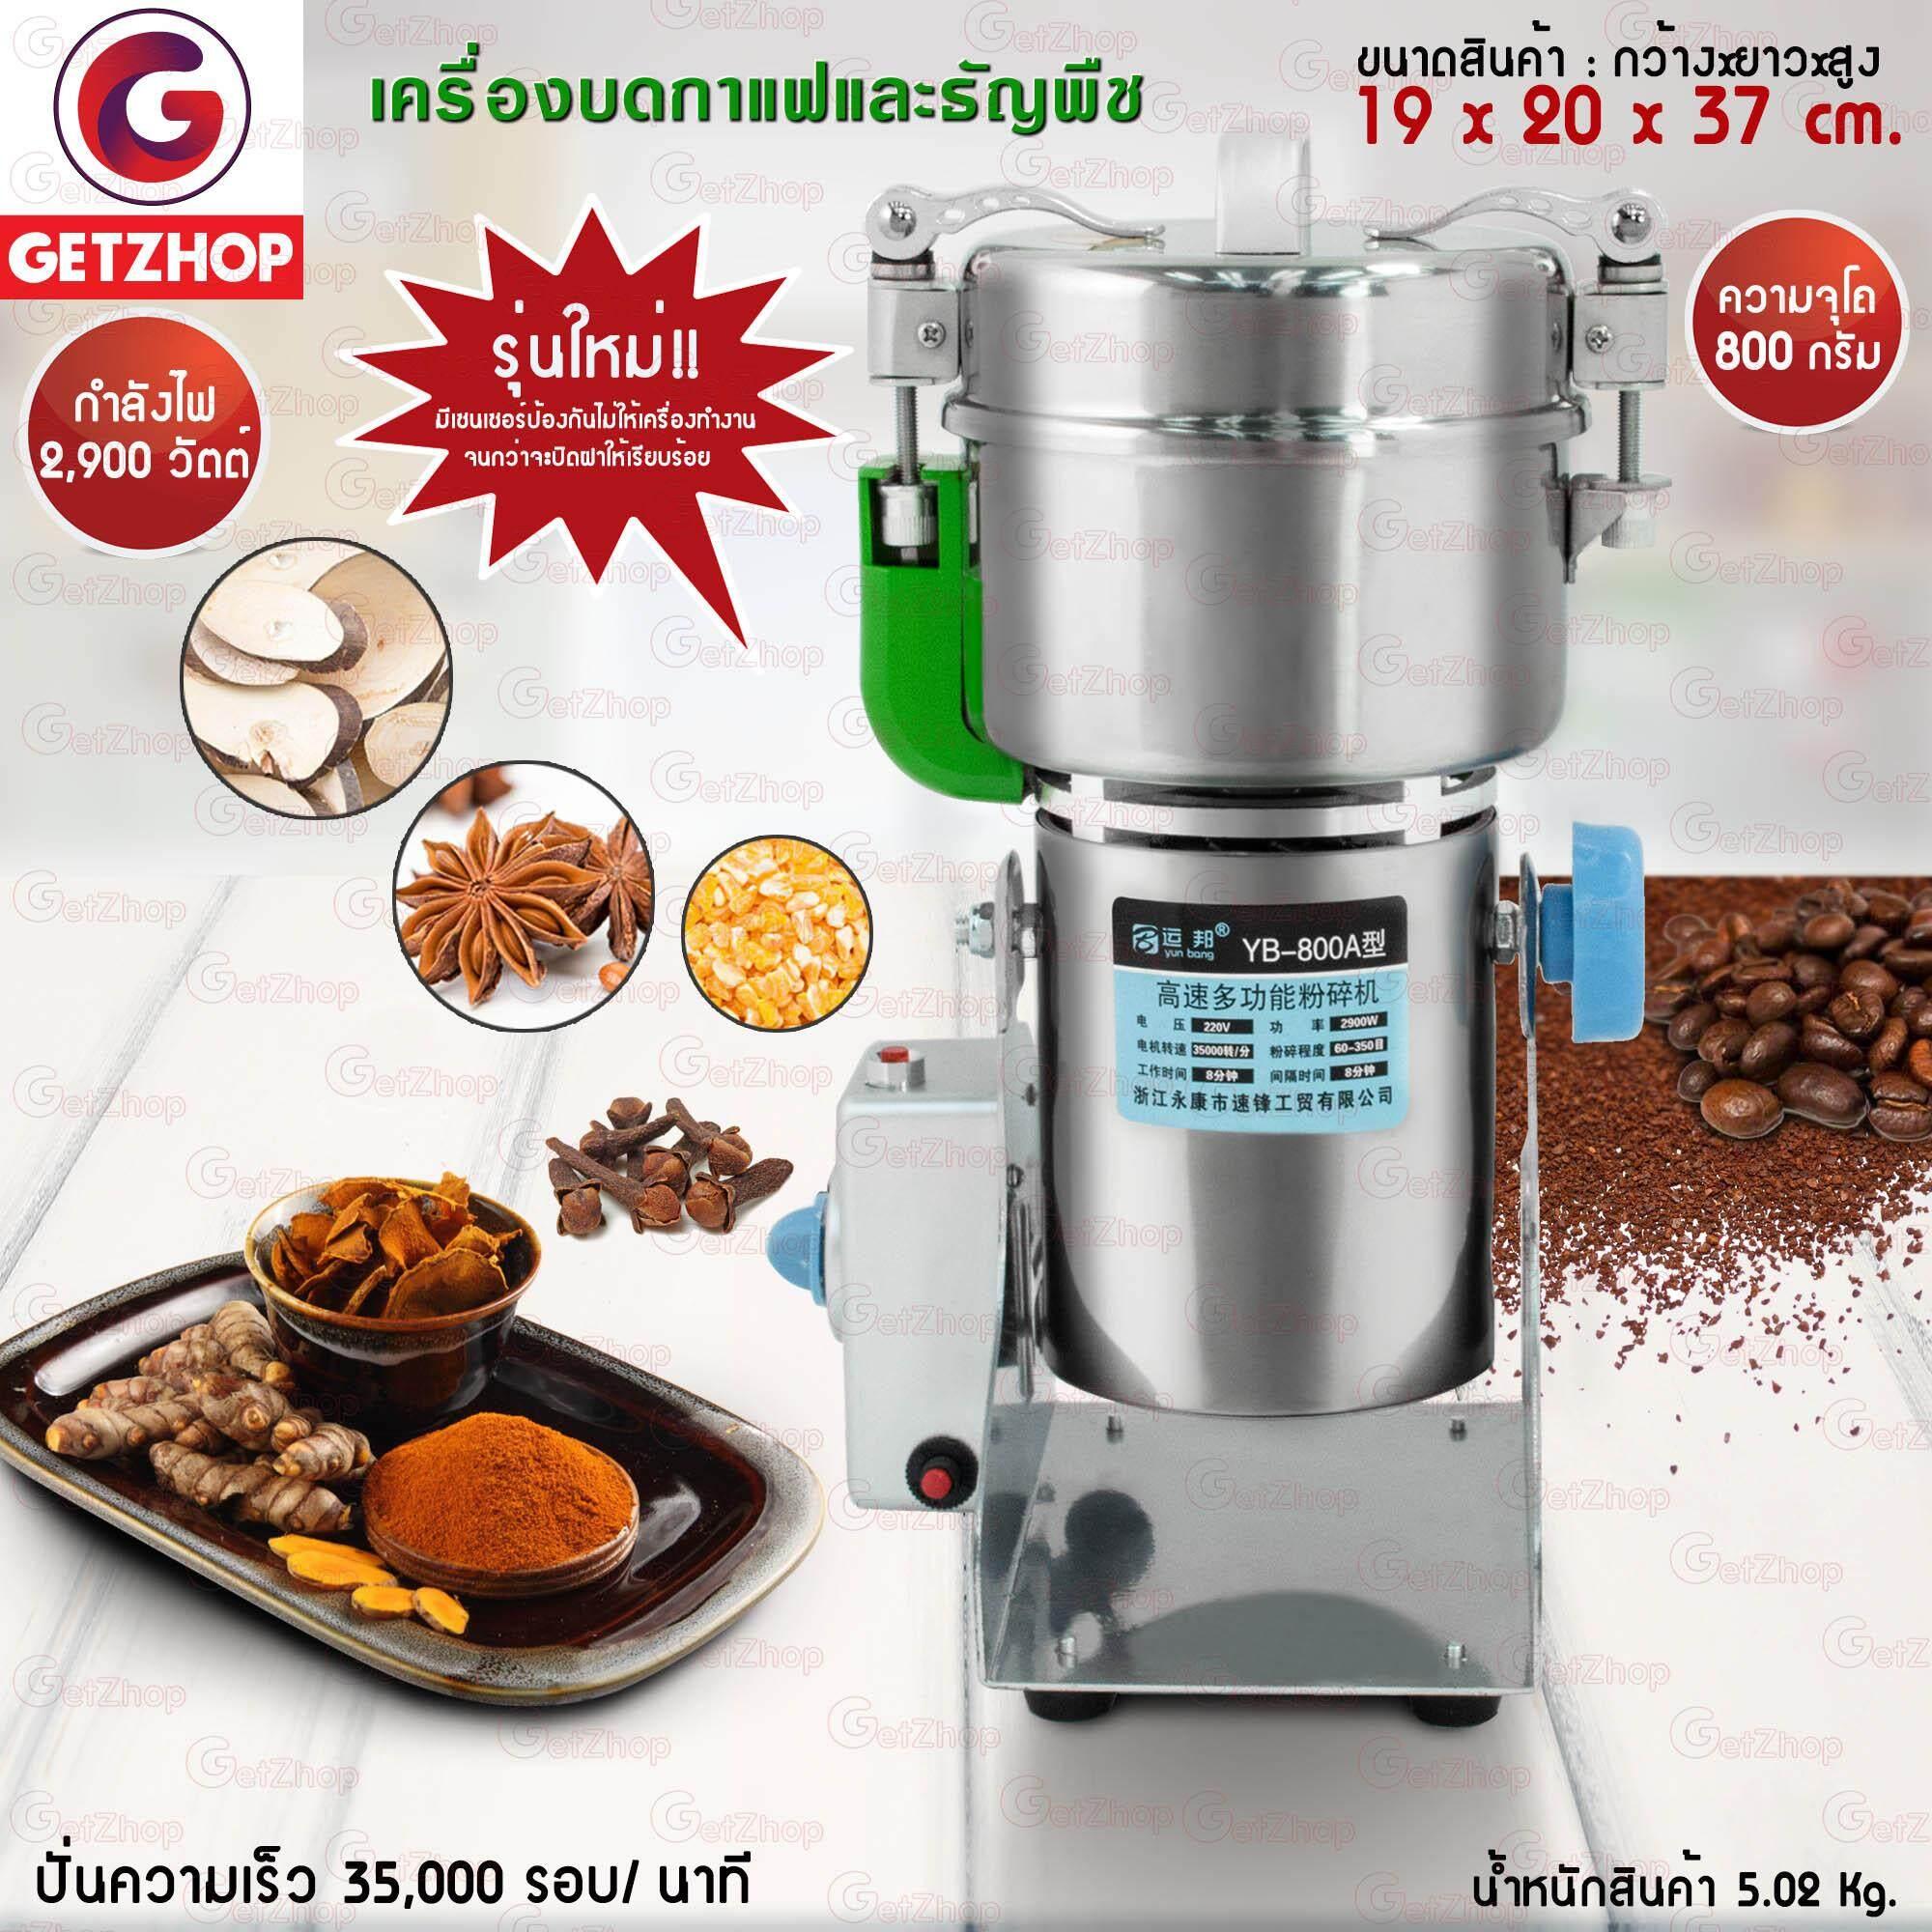 Thaibull เครื่องบดกาแฟและธัญพืช เครื่องบดอเนกประสงค์ บดของแห้ง สมุนไพร 800g กำลังไฟ  2,900 Watt Yun Bang รุ่น YB-800A (Stainless) รุ่นใหม่ ! คุณภาพดี